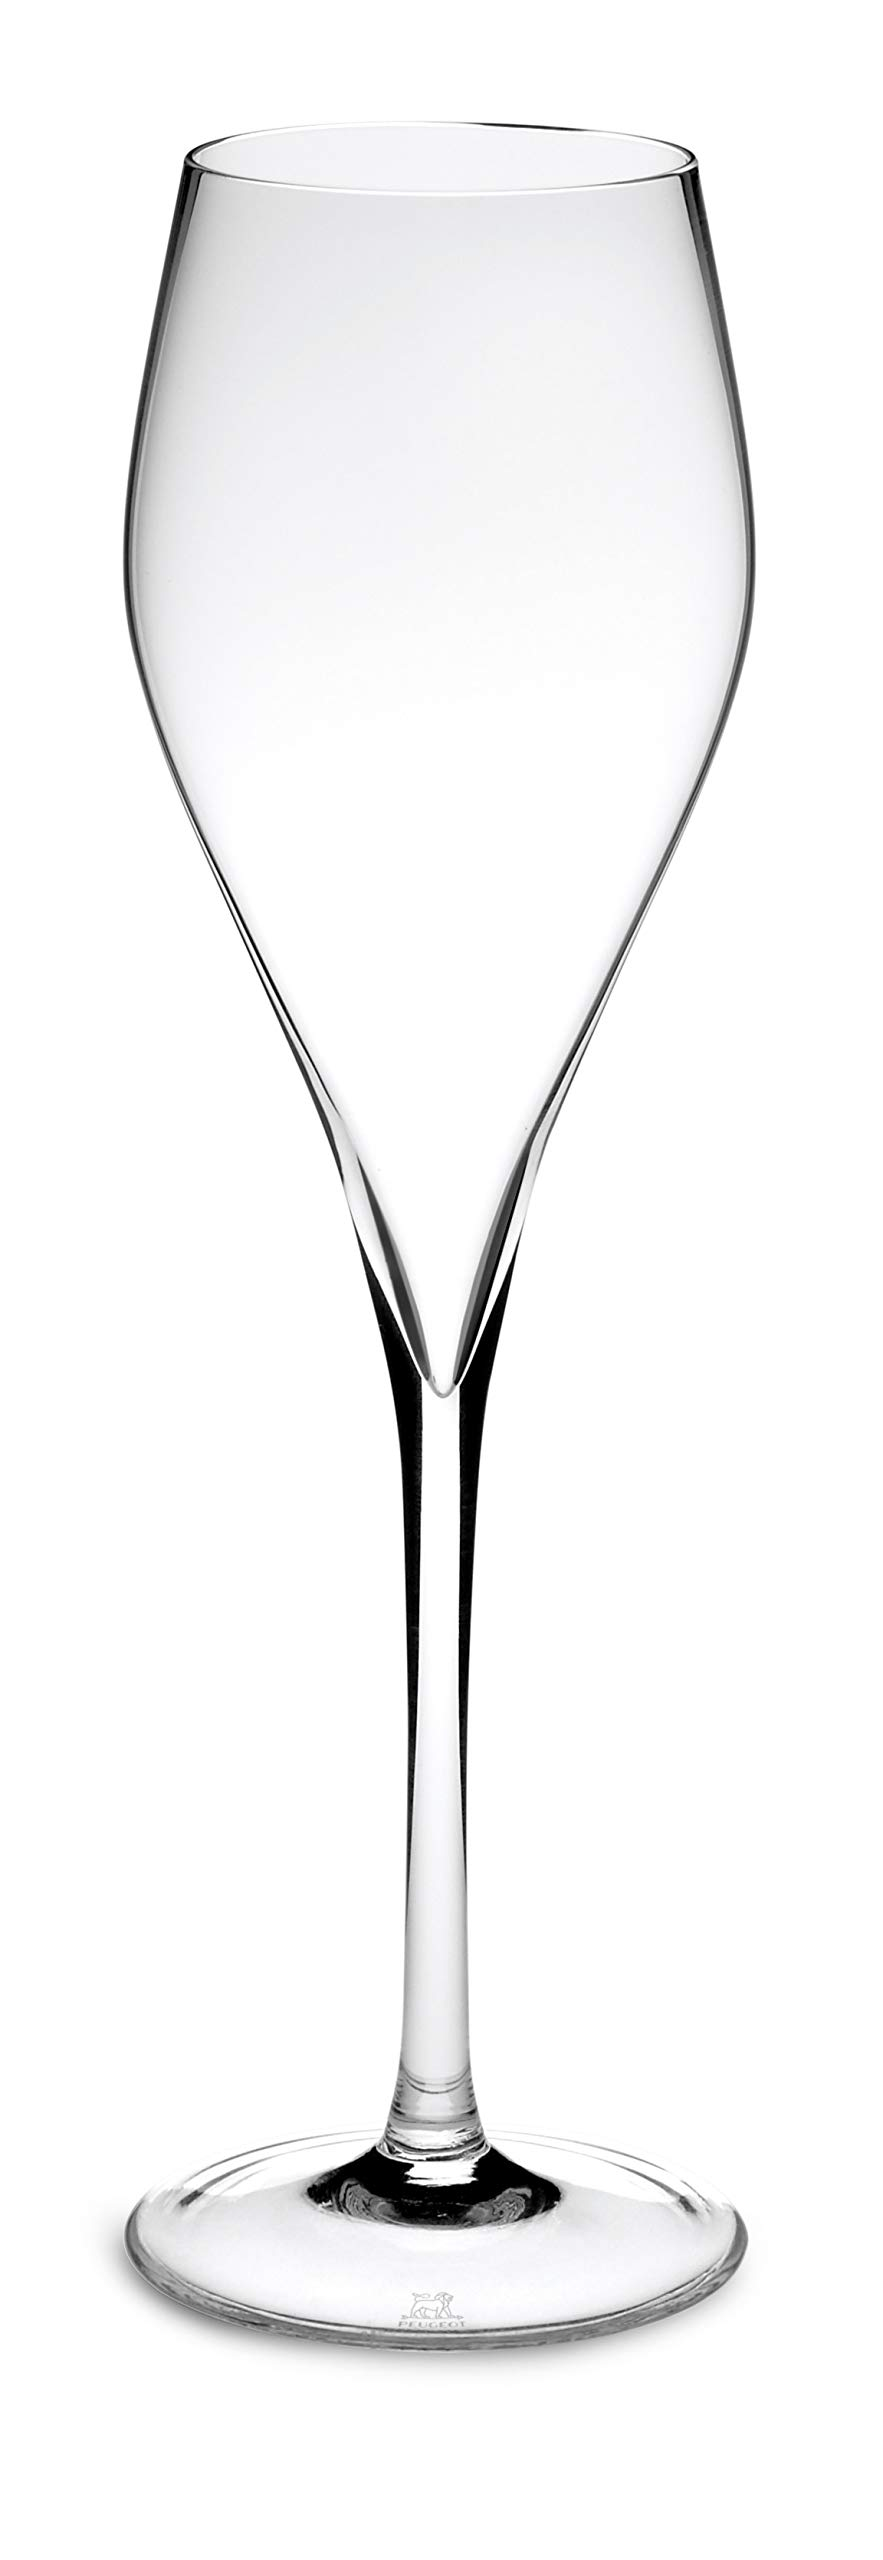 Peugeot 250195 Esprit Champagne Tasting Glasses, Set of 4